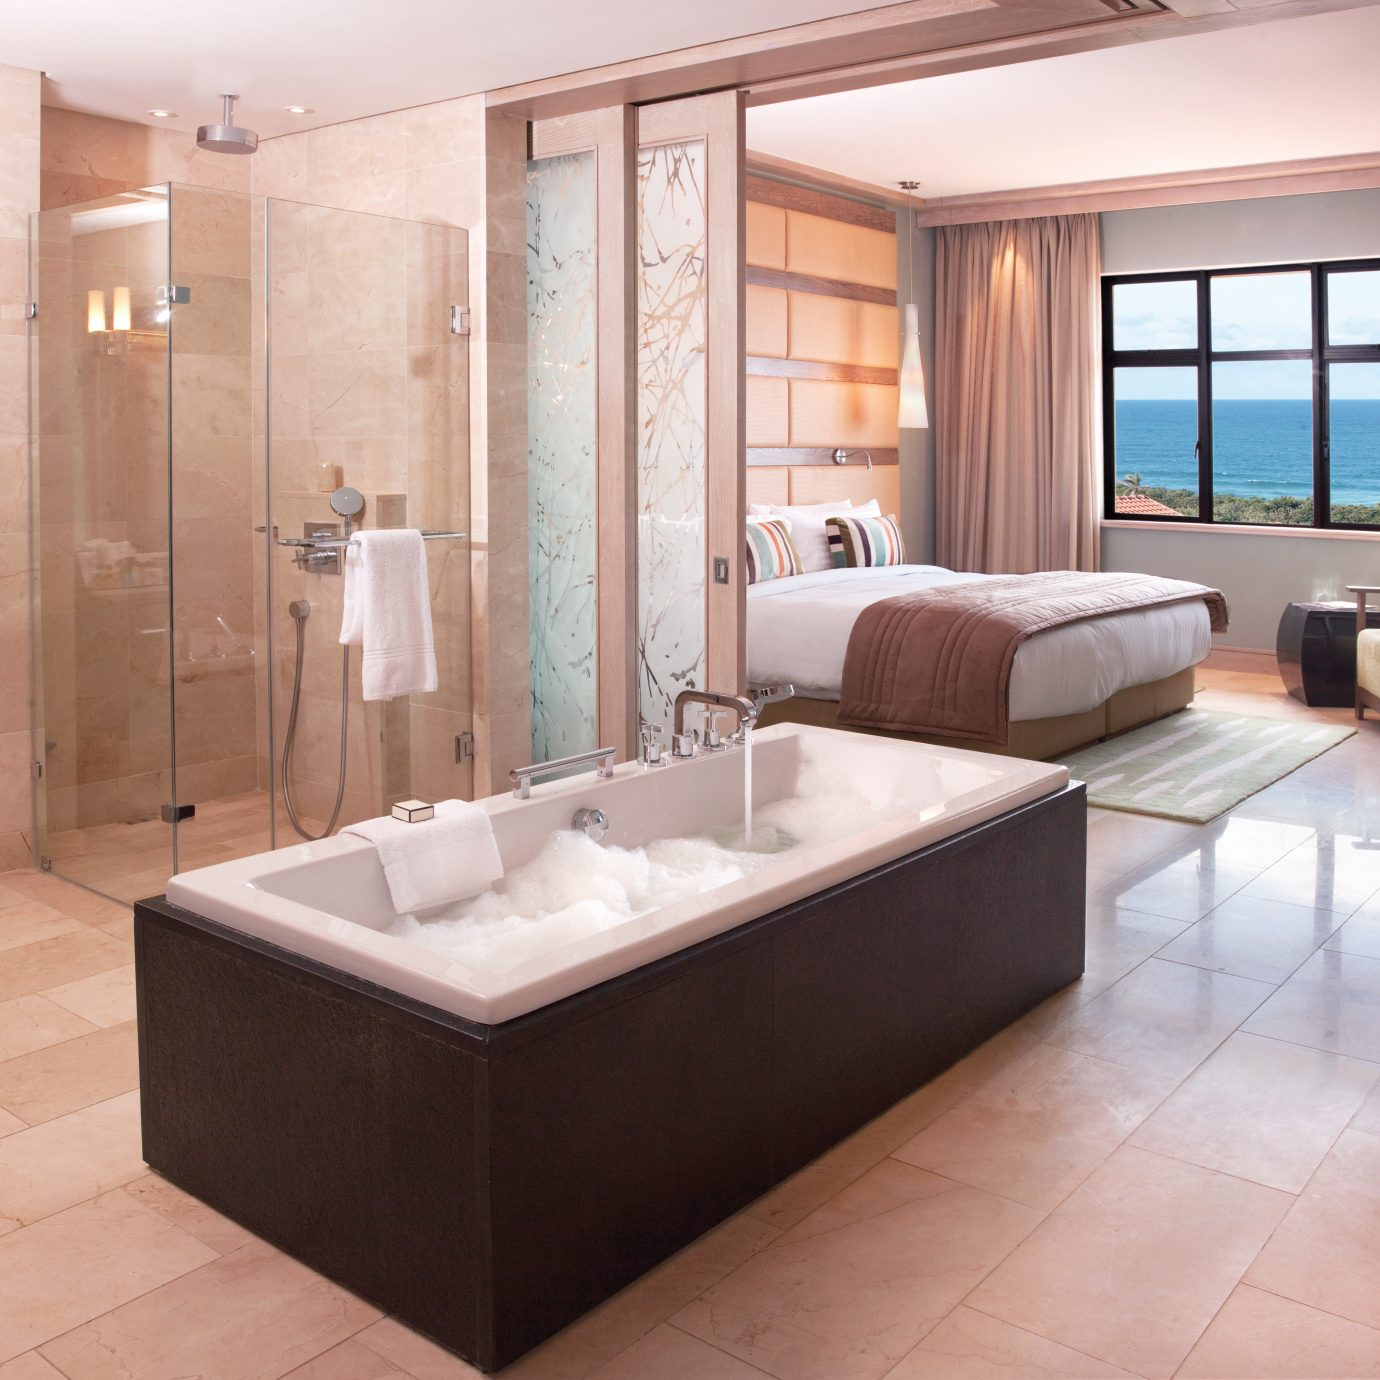 bathroom property swimming pool sink Suite bathtub flooring tub Modern tiled tile